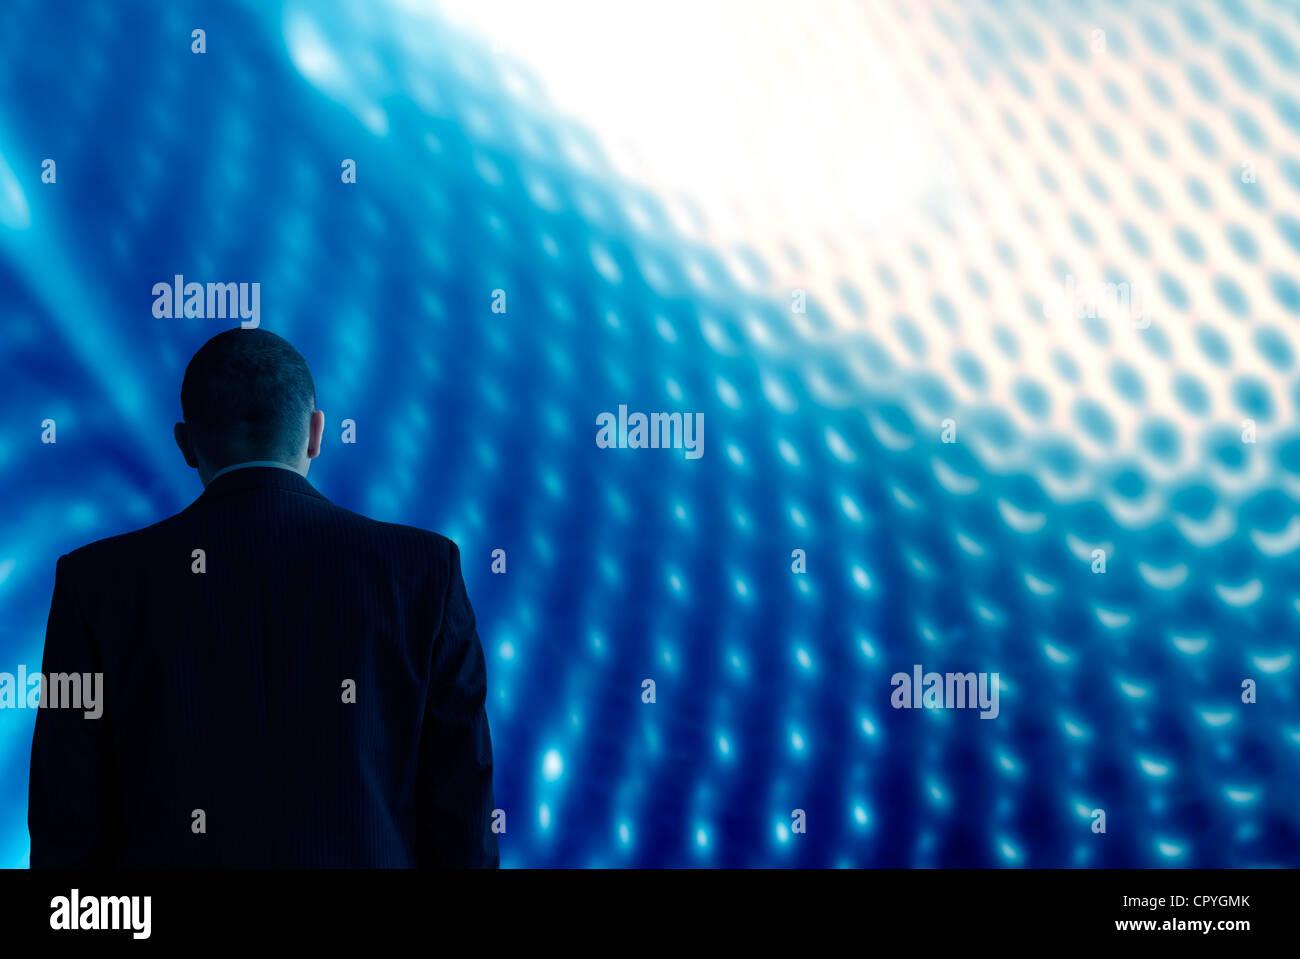 Examiner la future technologie fond bleu avec l'homme Photo Stock